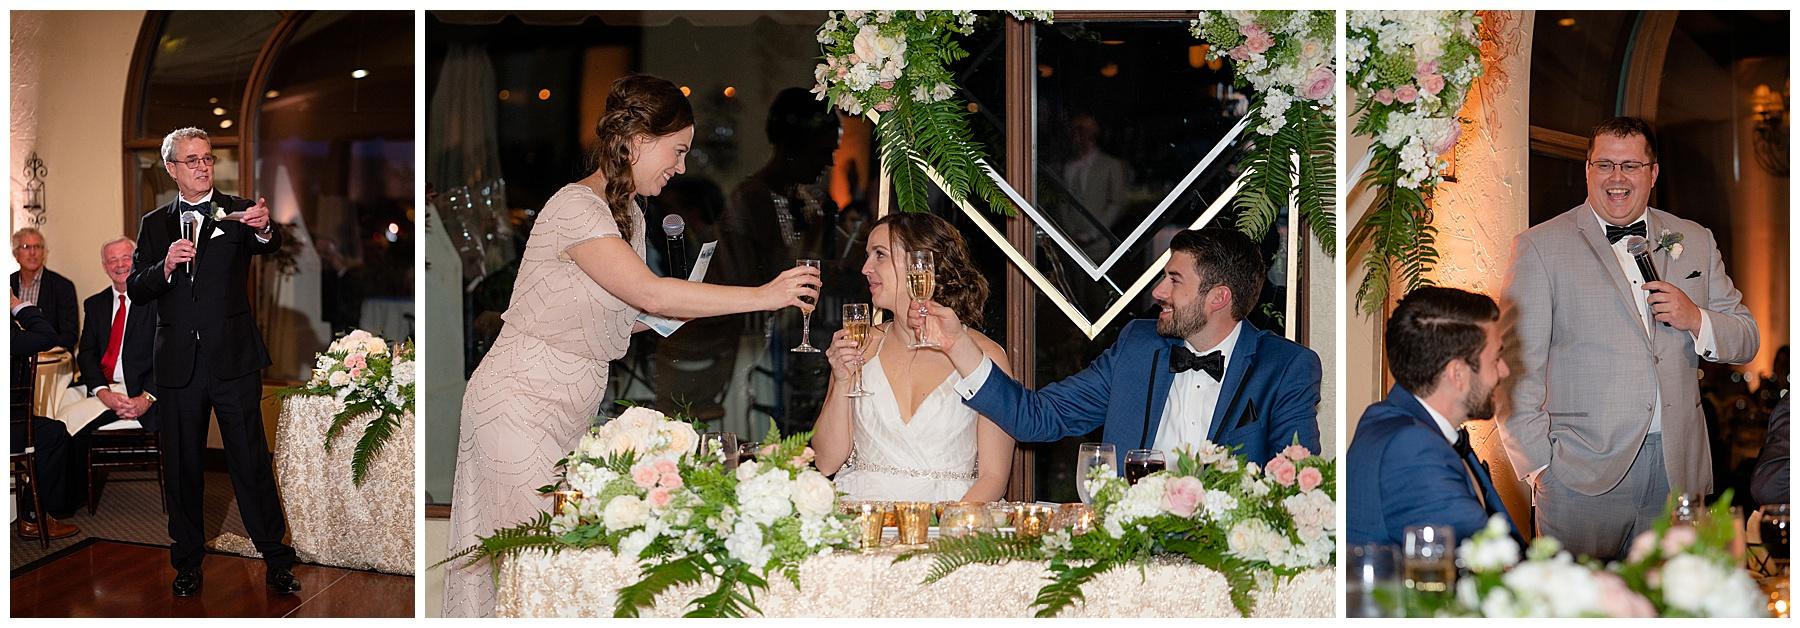 talega golf club weddings toasts